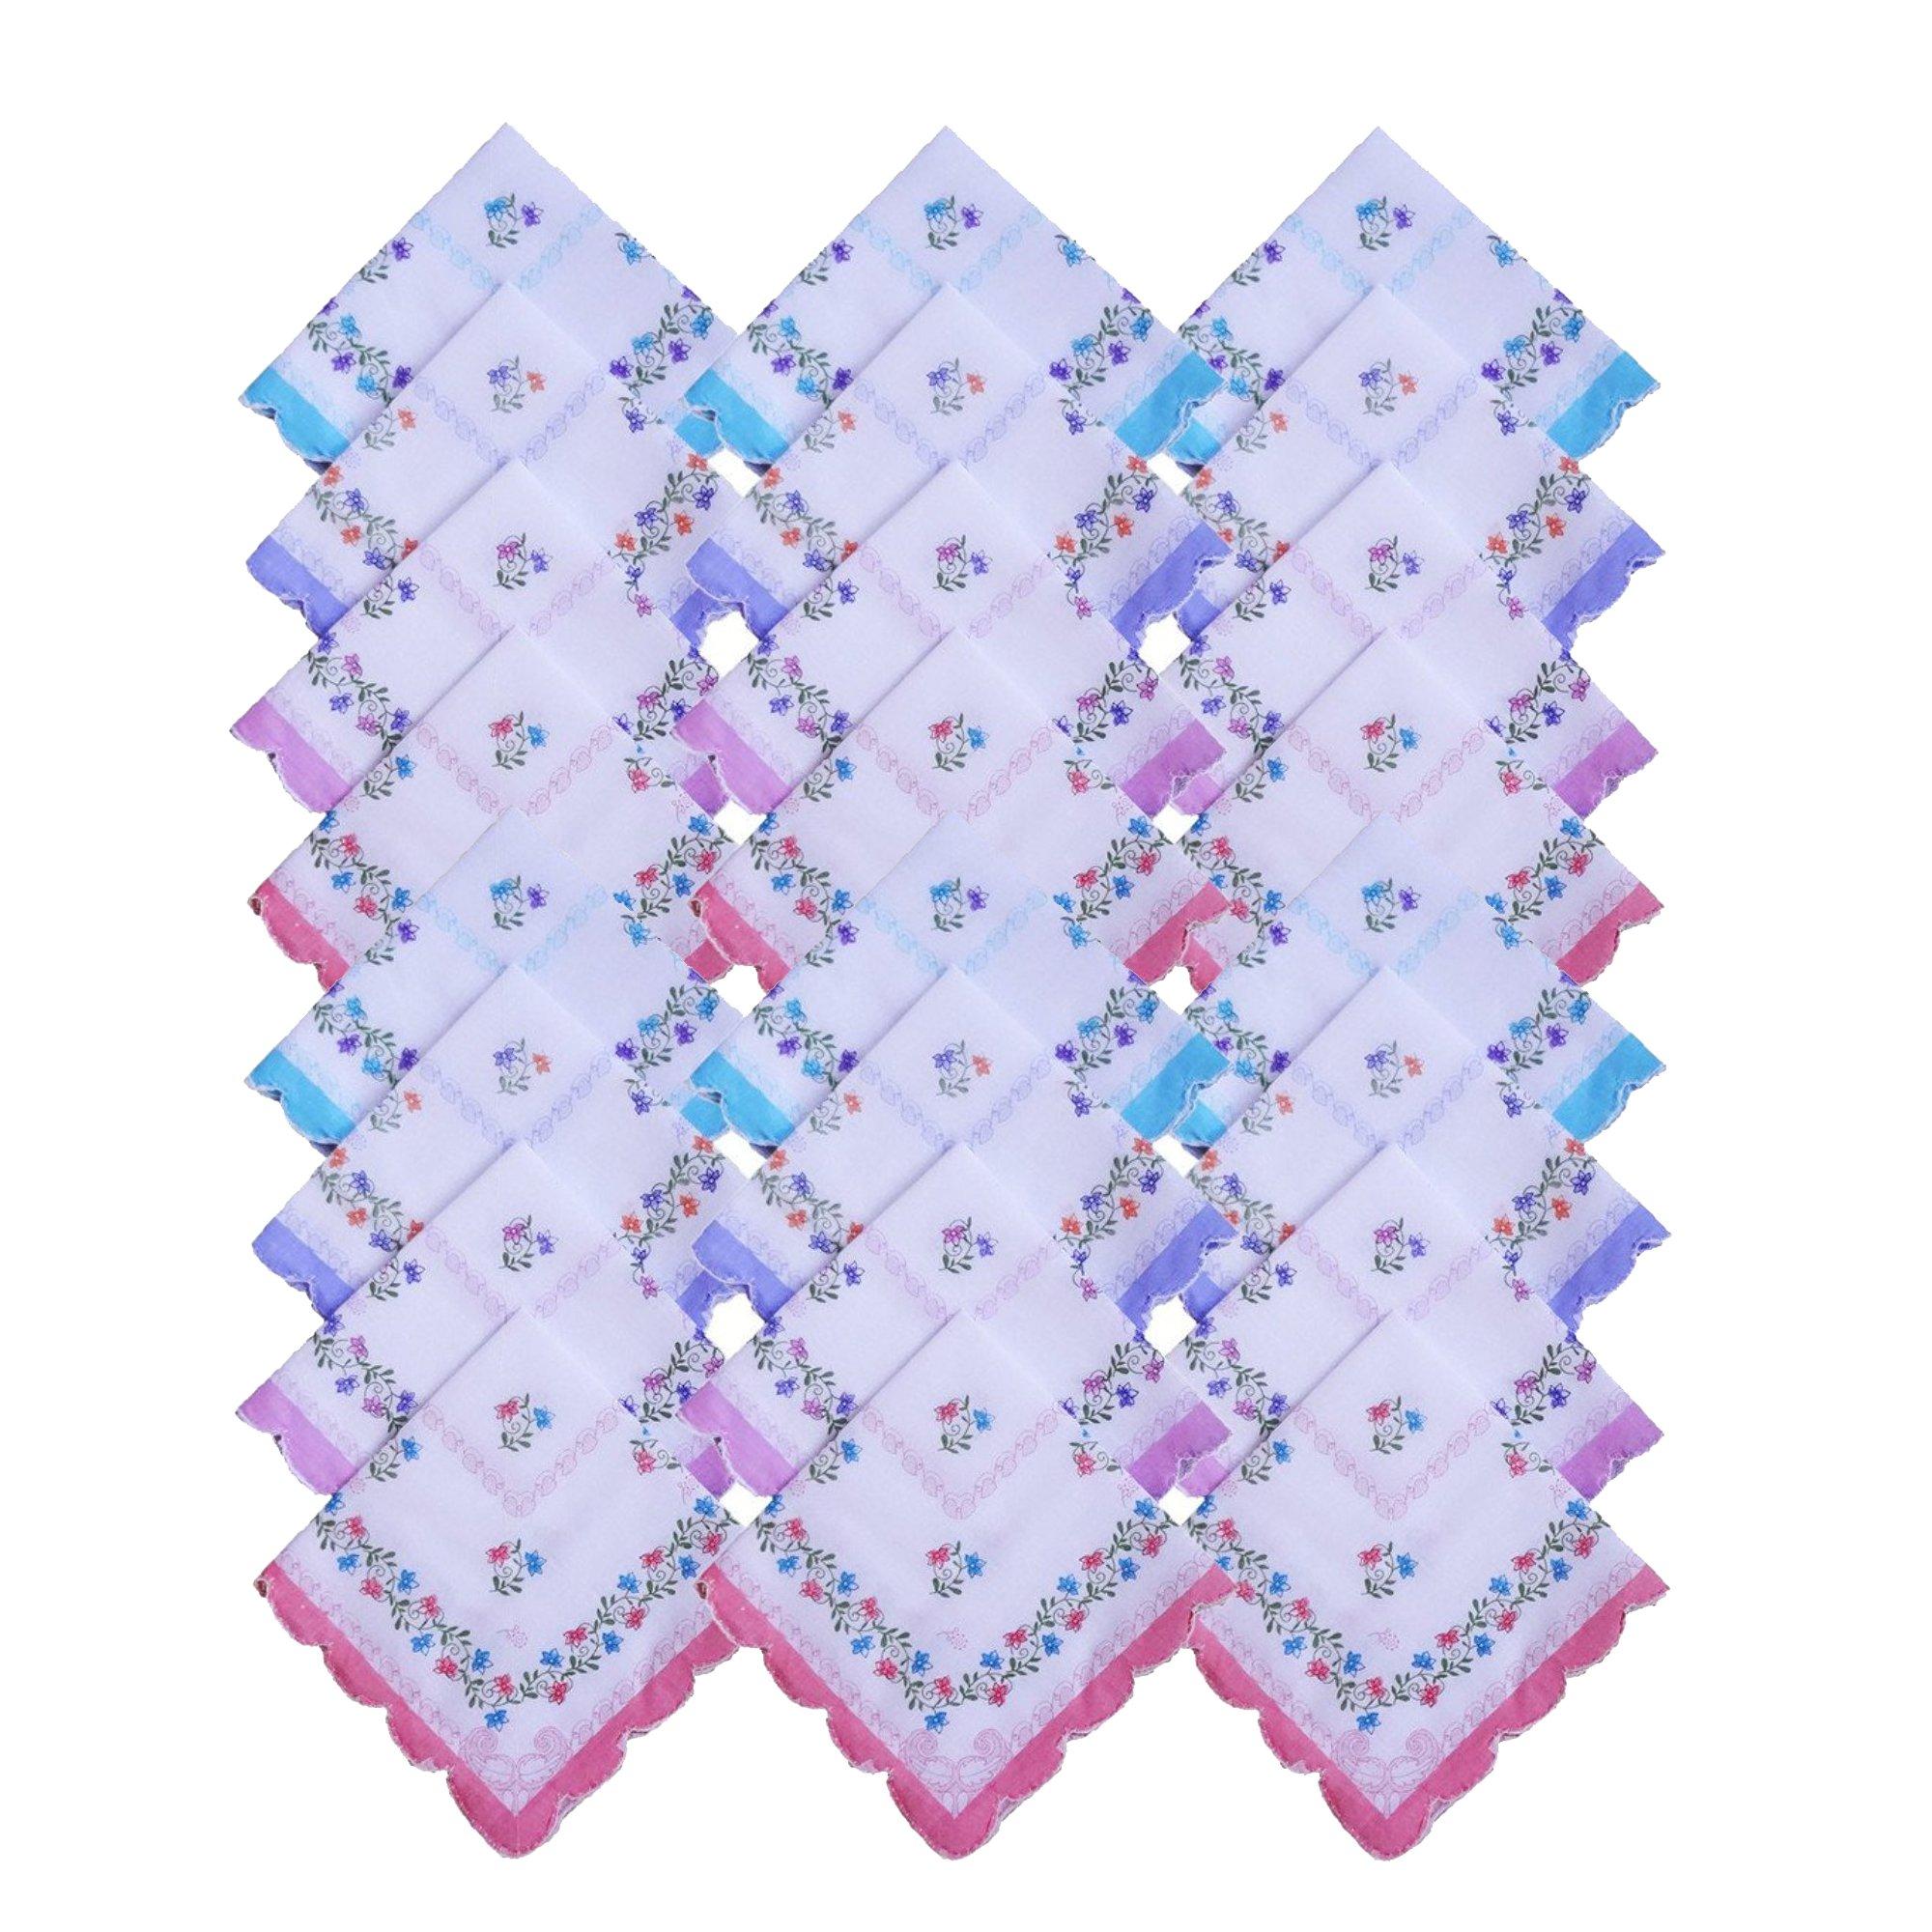 S4S 100% Cotton Women's Floral Handkerchief (Pack of 24)